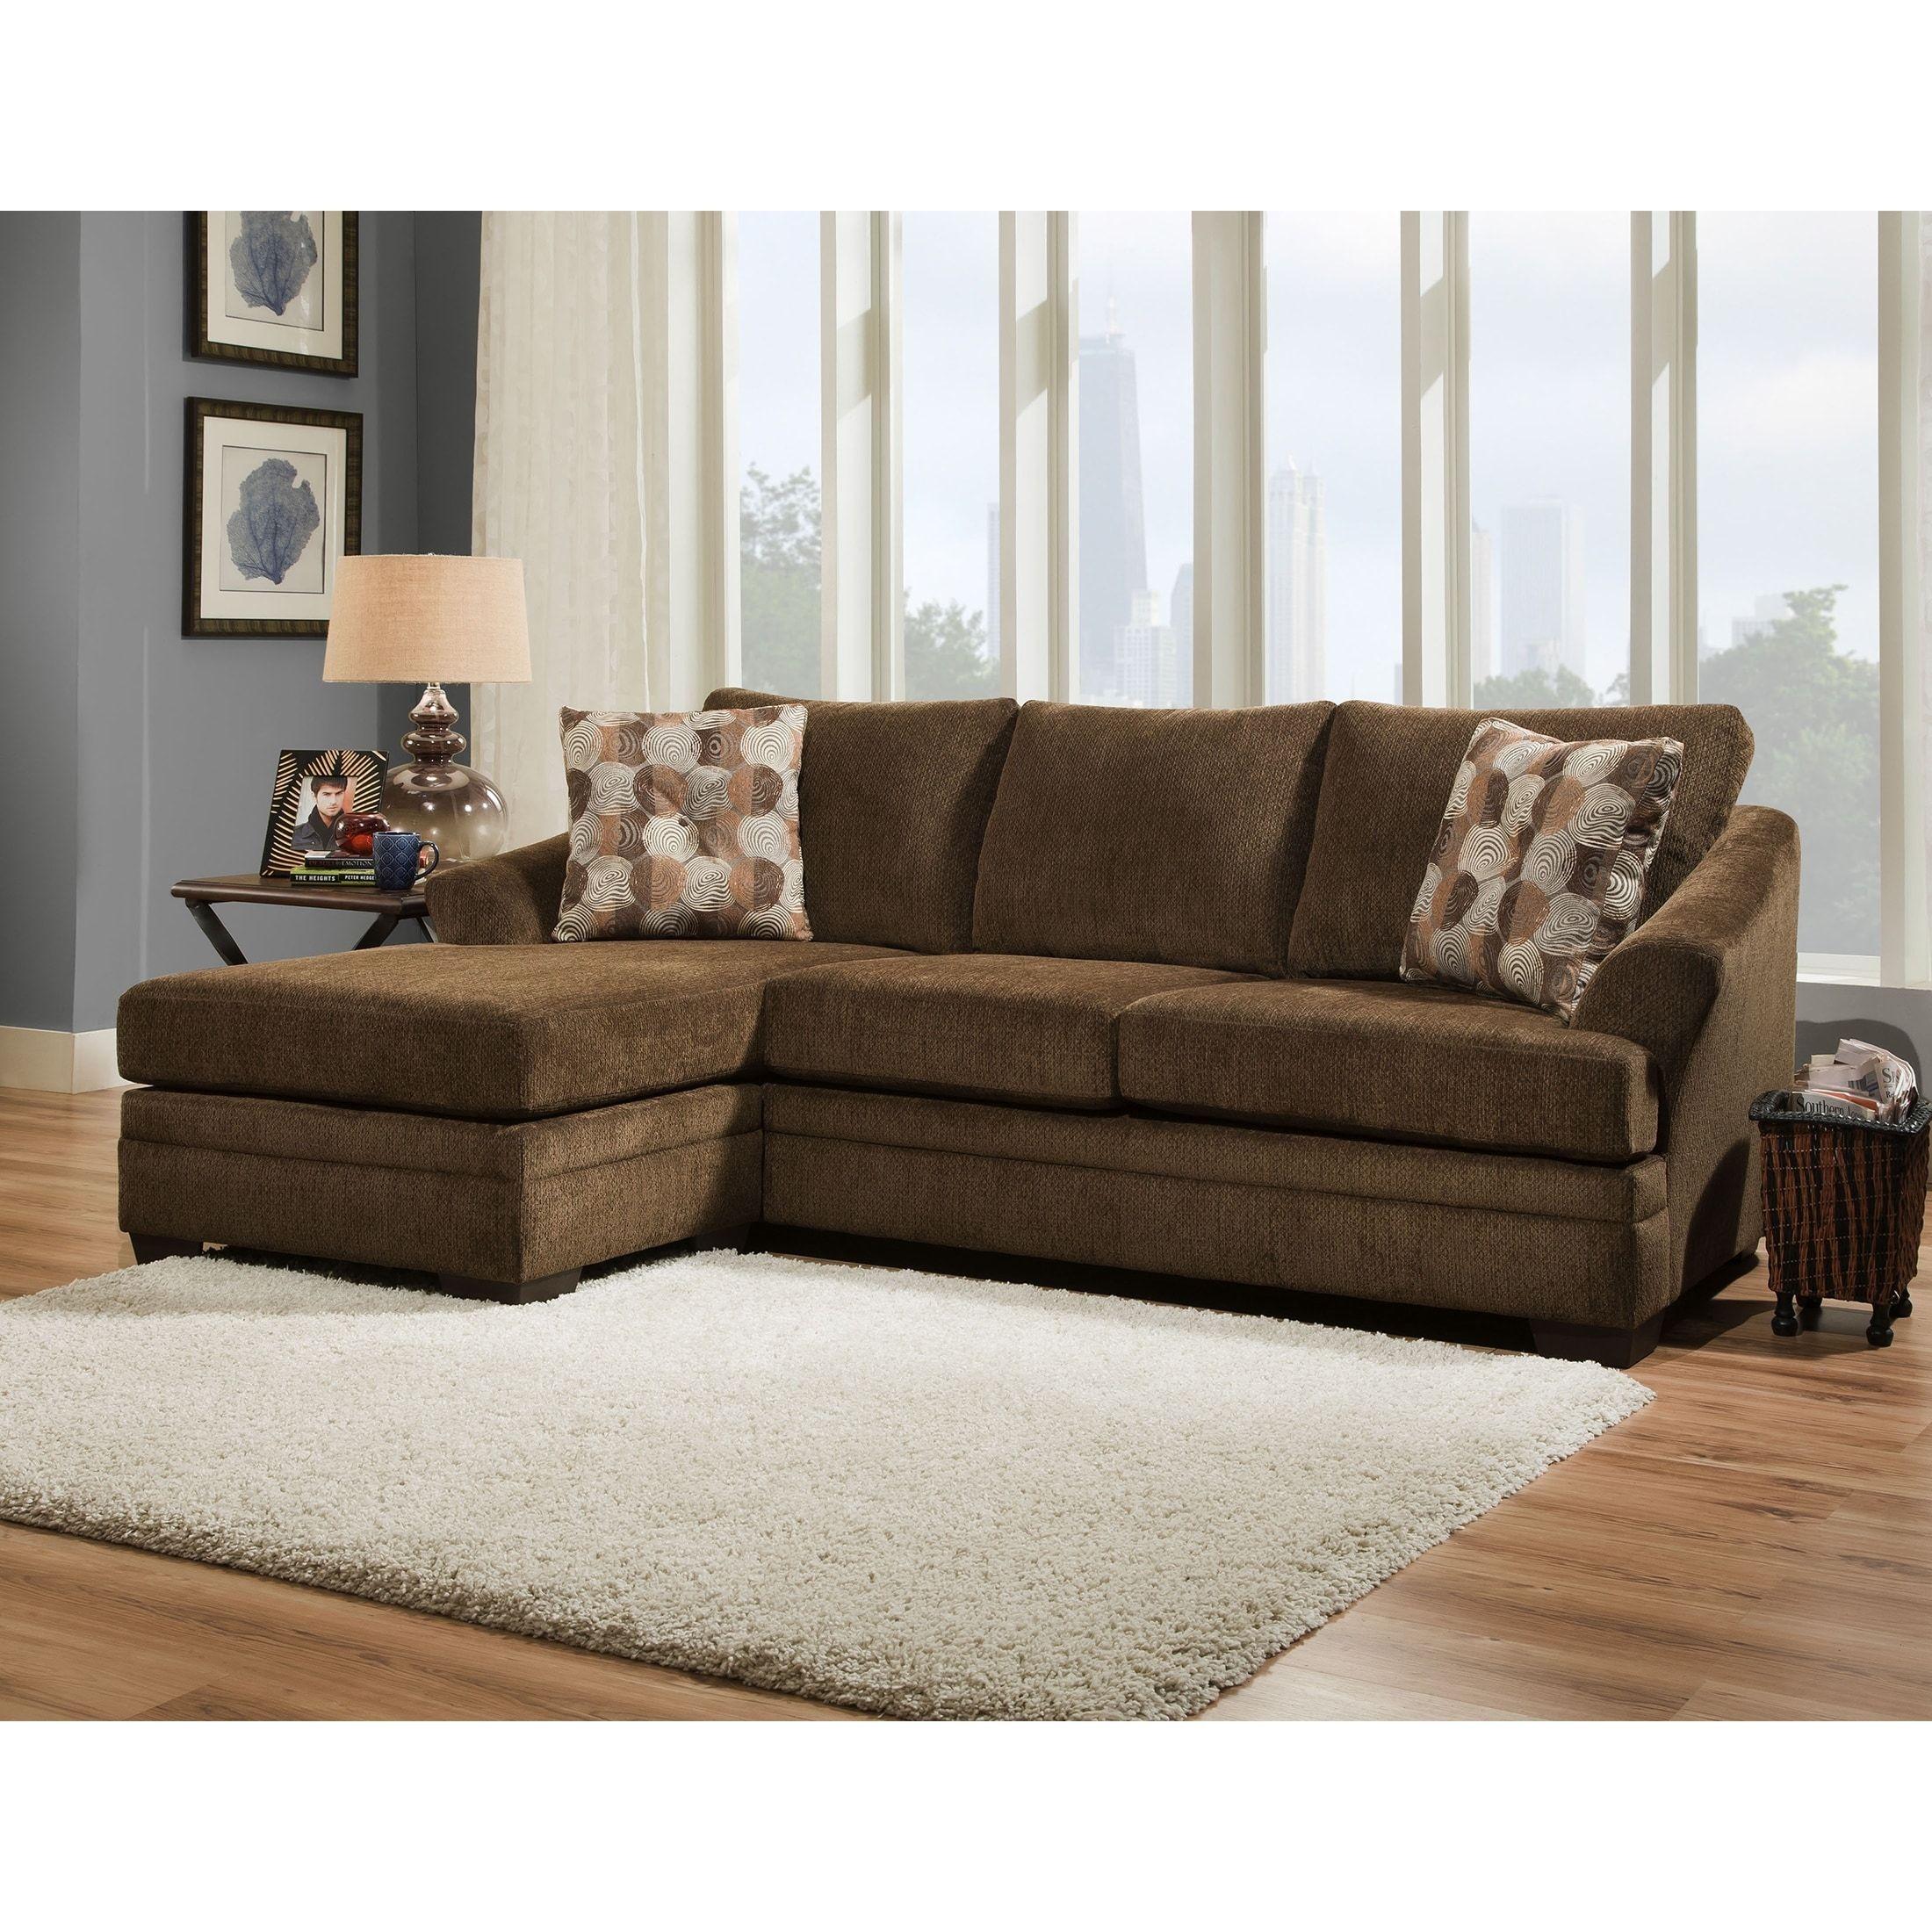 Simmons Chaise Sofas Chaise Sofa Sectional Sofa Sofa